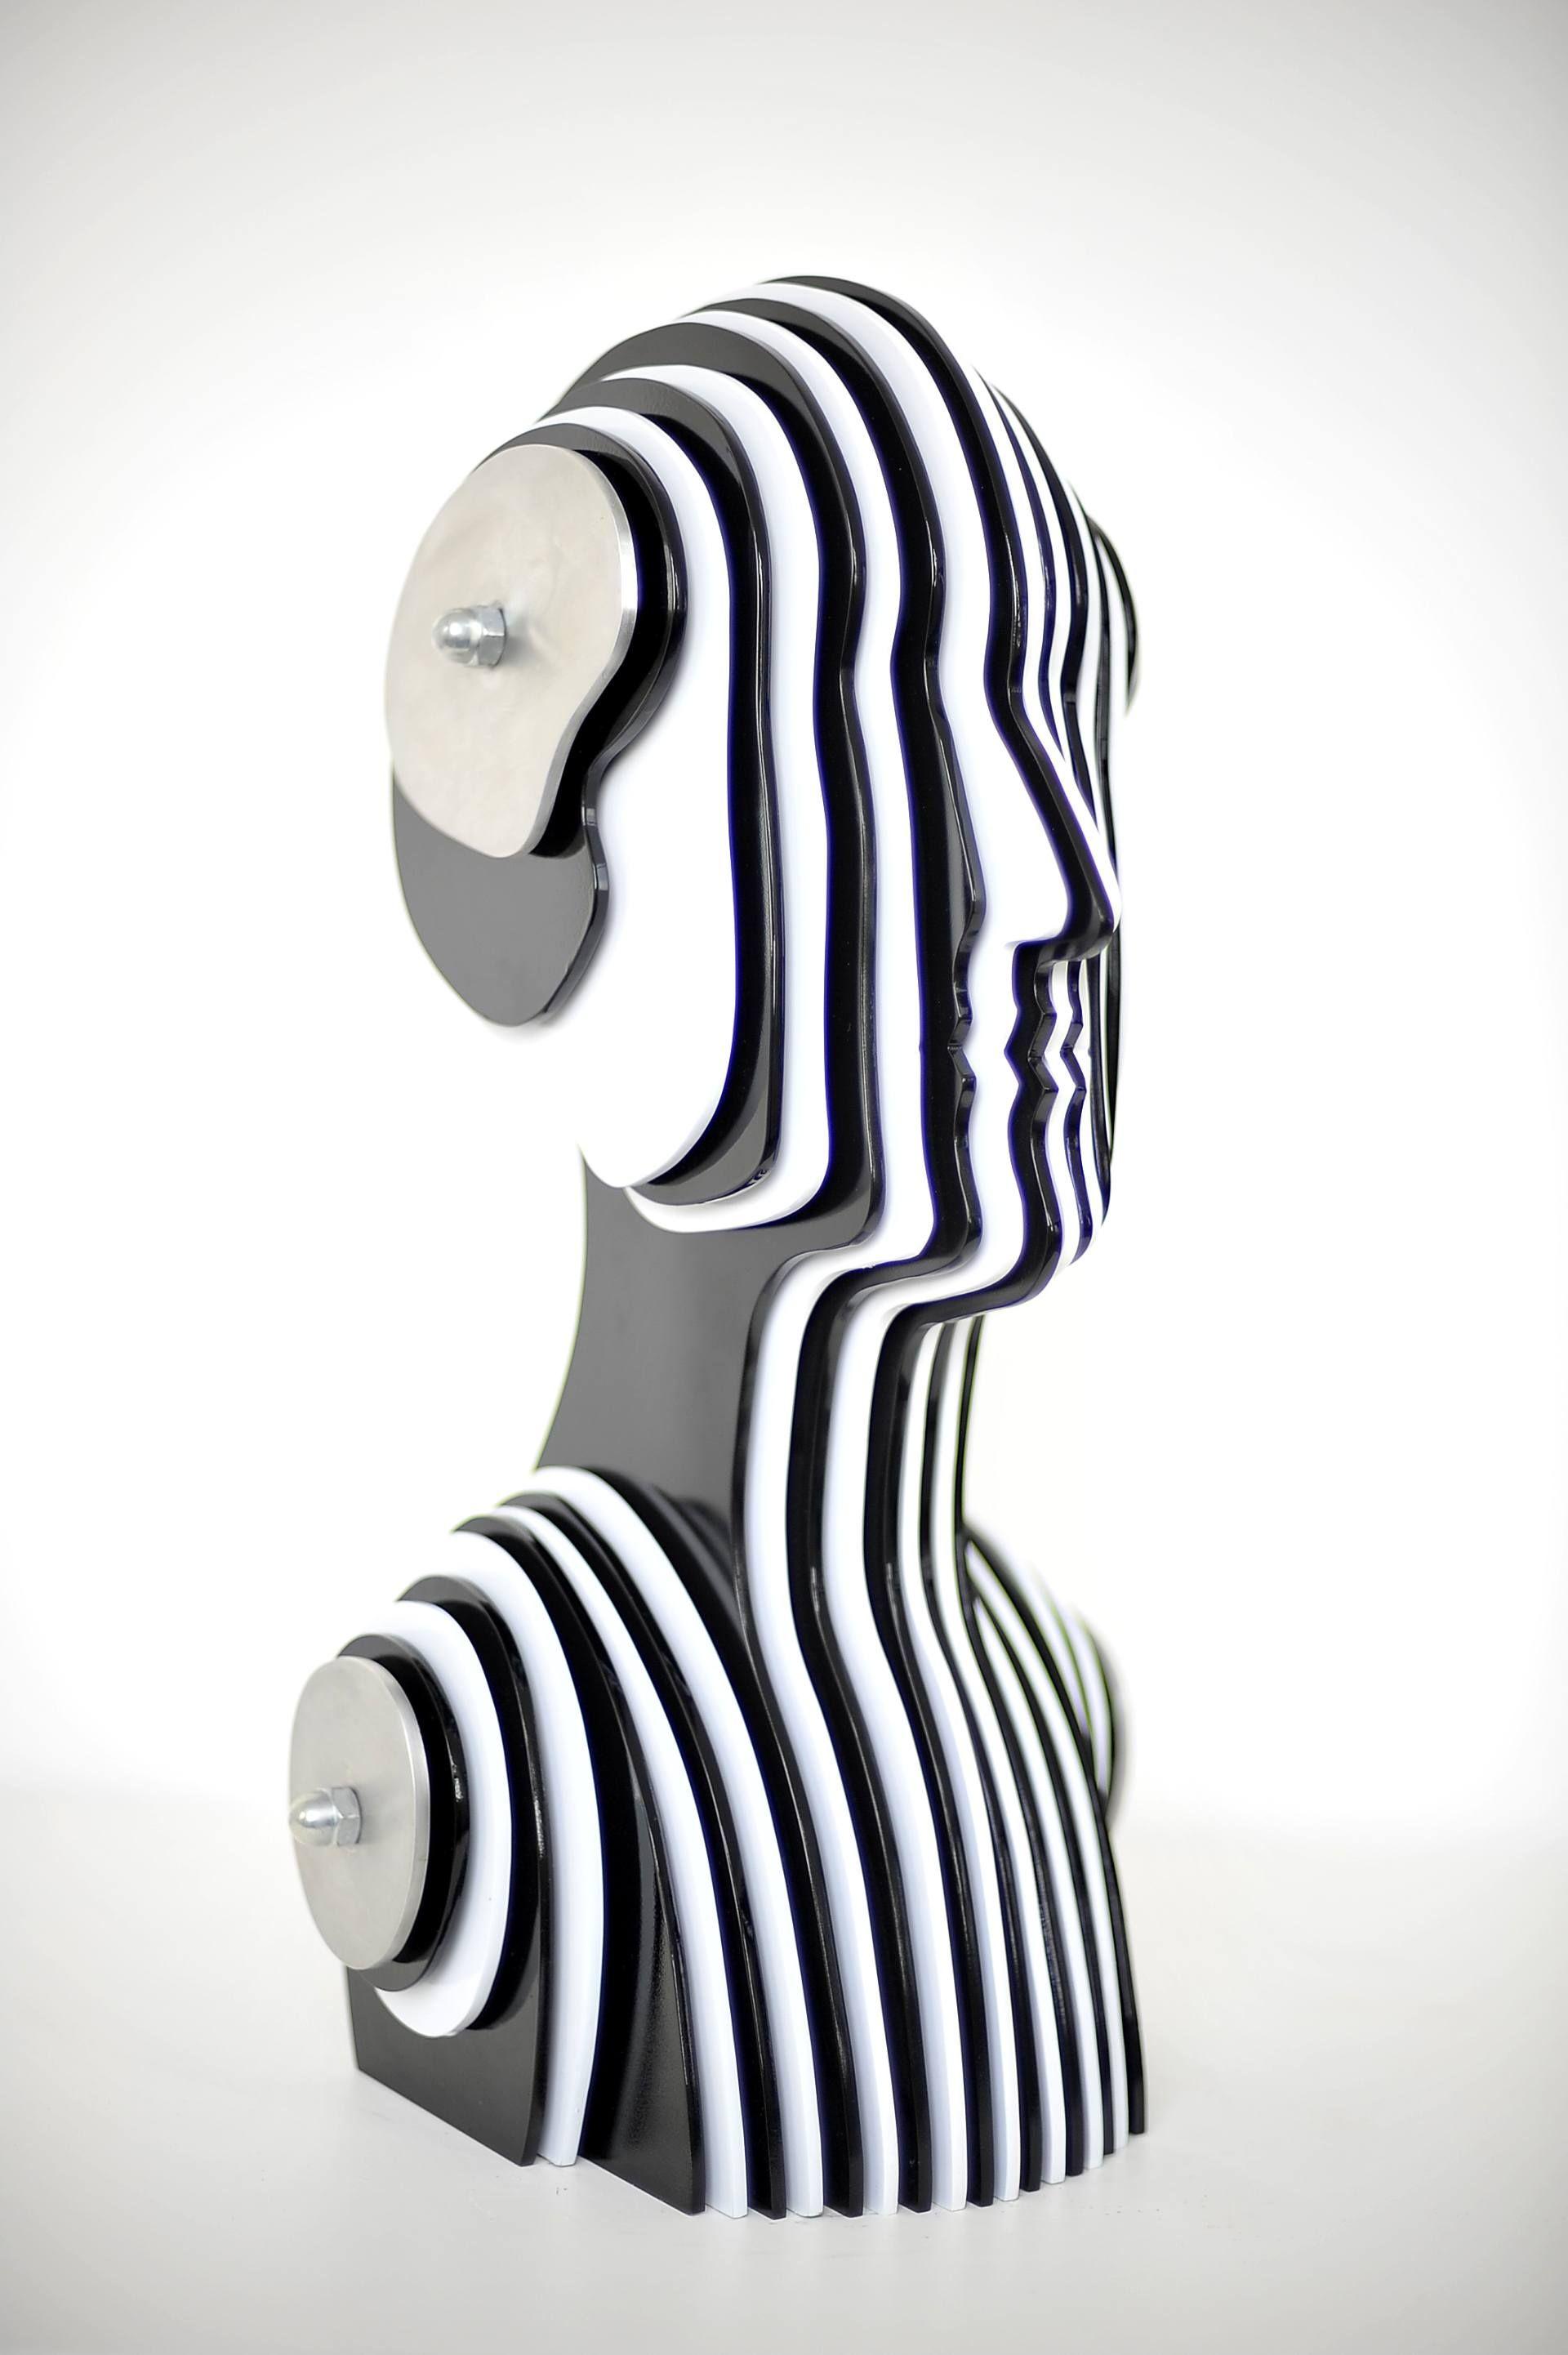 Art fairs mechanical movement metal paris russia sculptures wood - Explore Metal Sculptures Saatchi Online And More